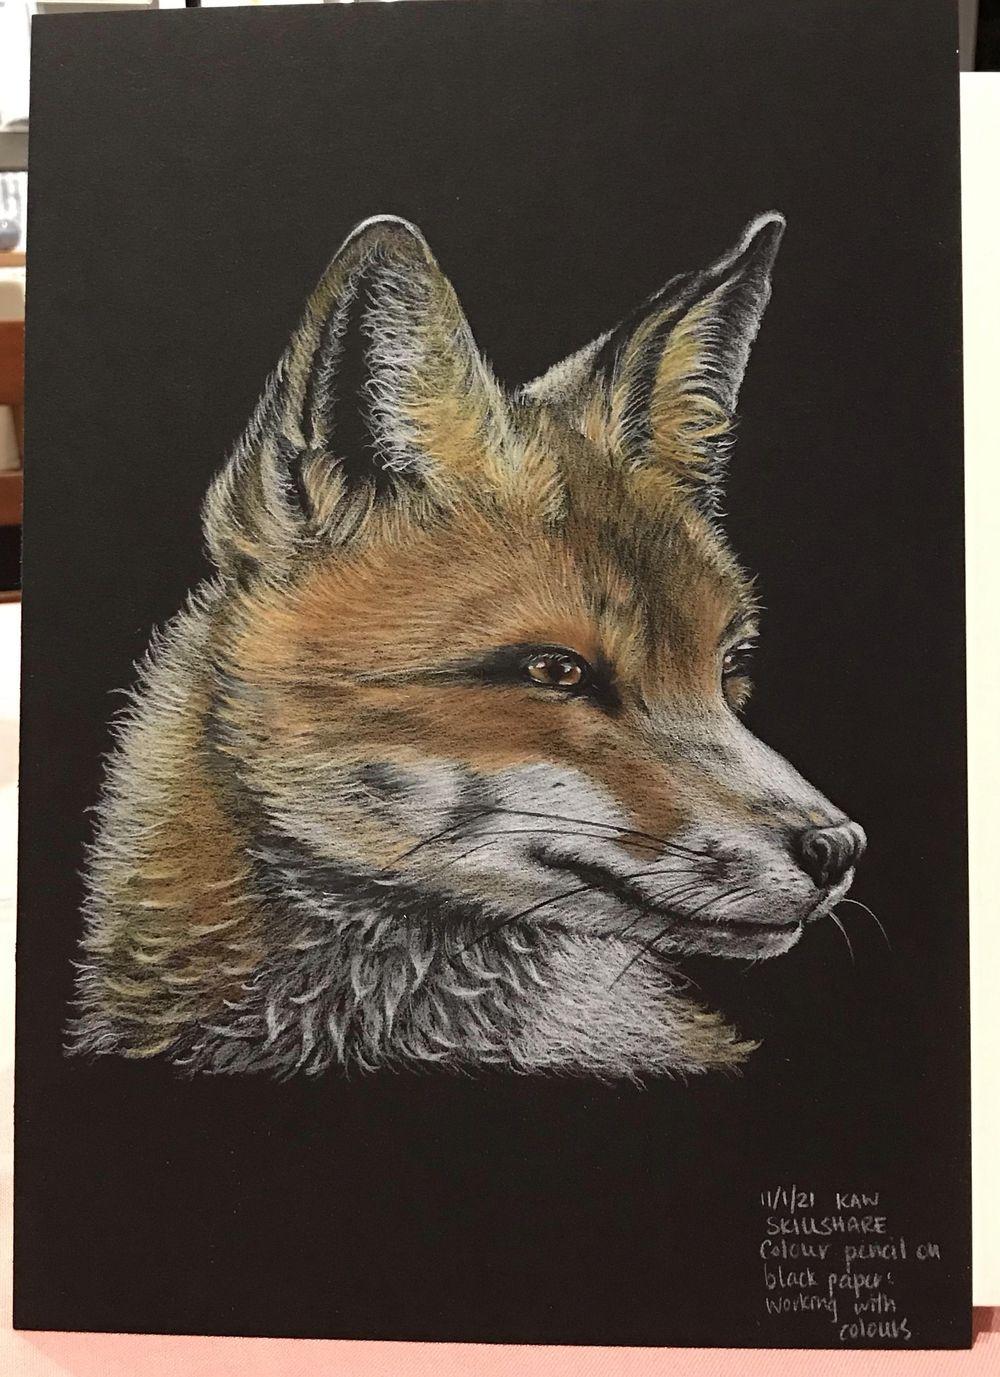 Foxy Loxy - image 1 - student project